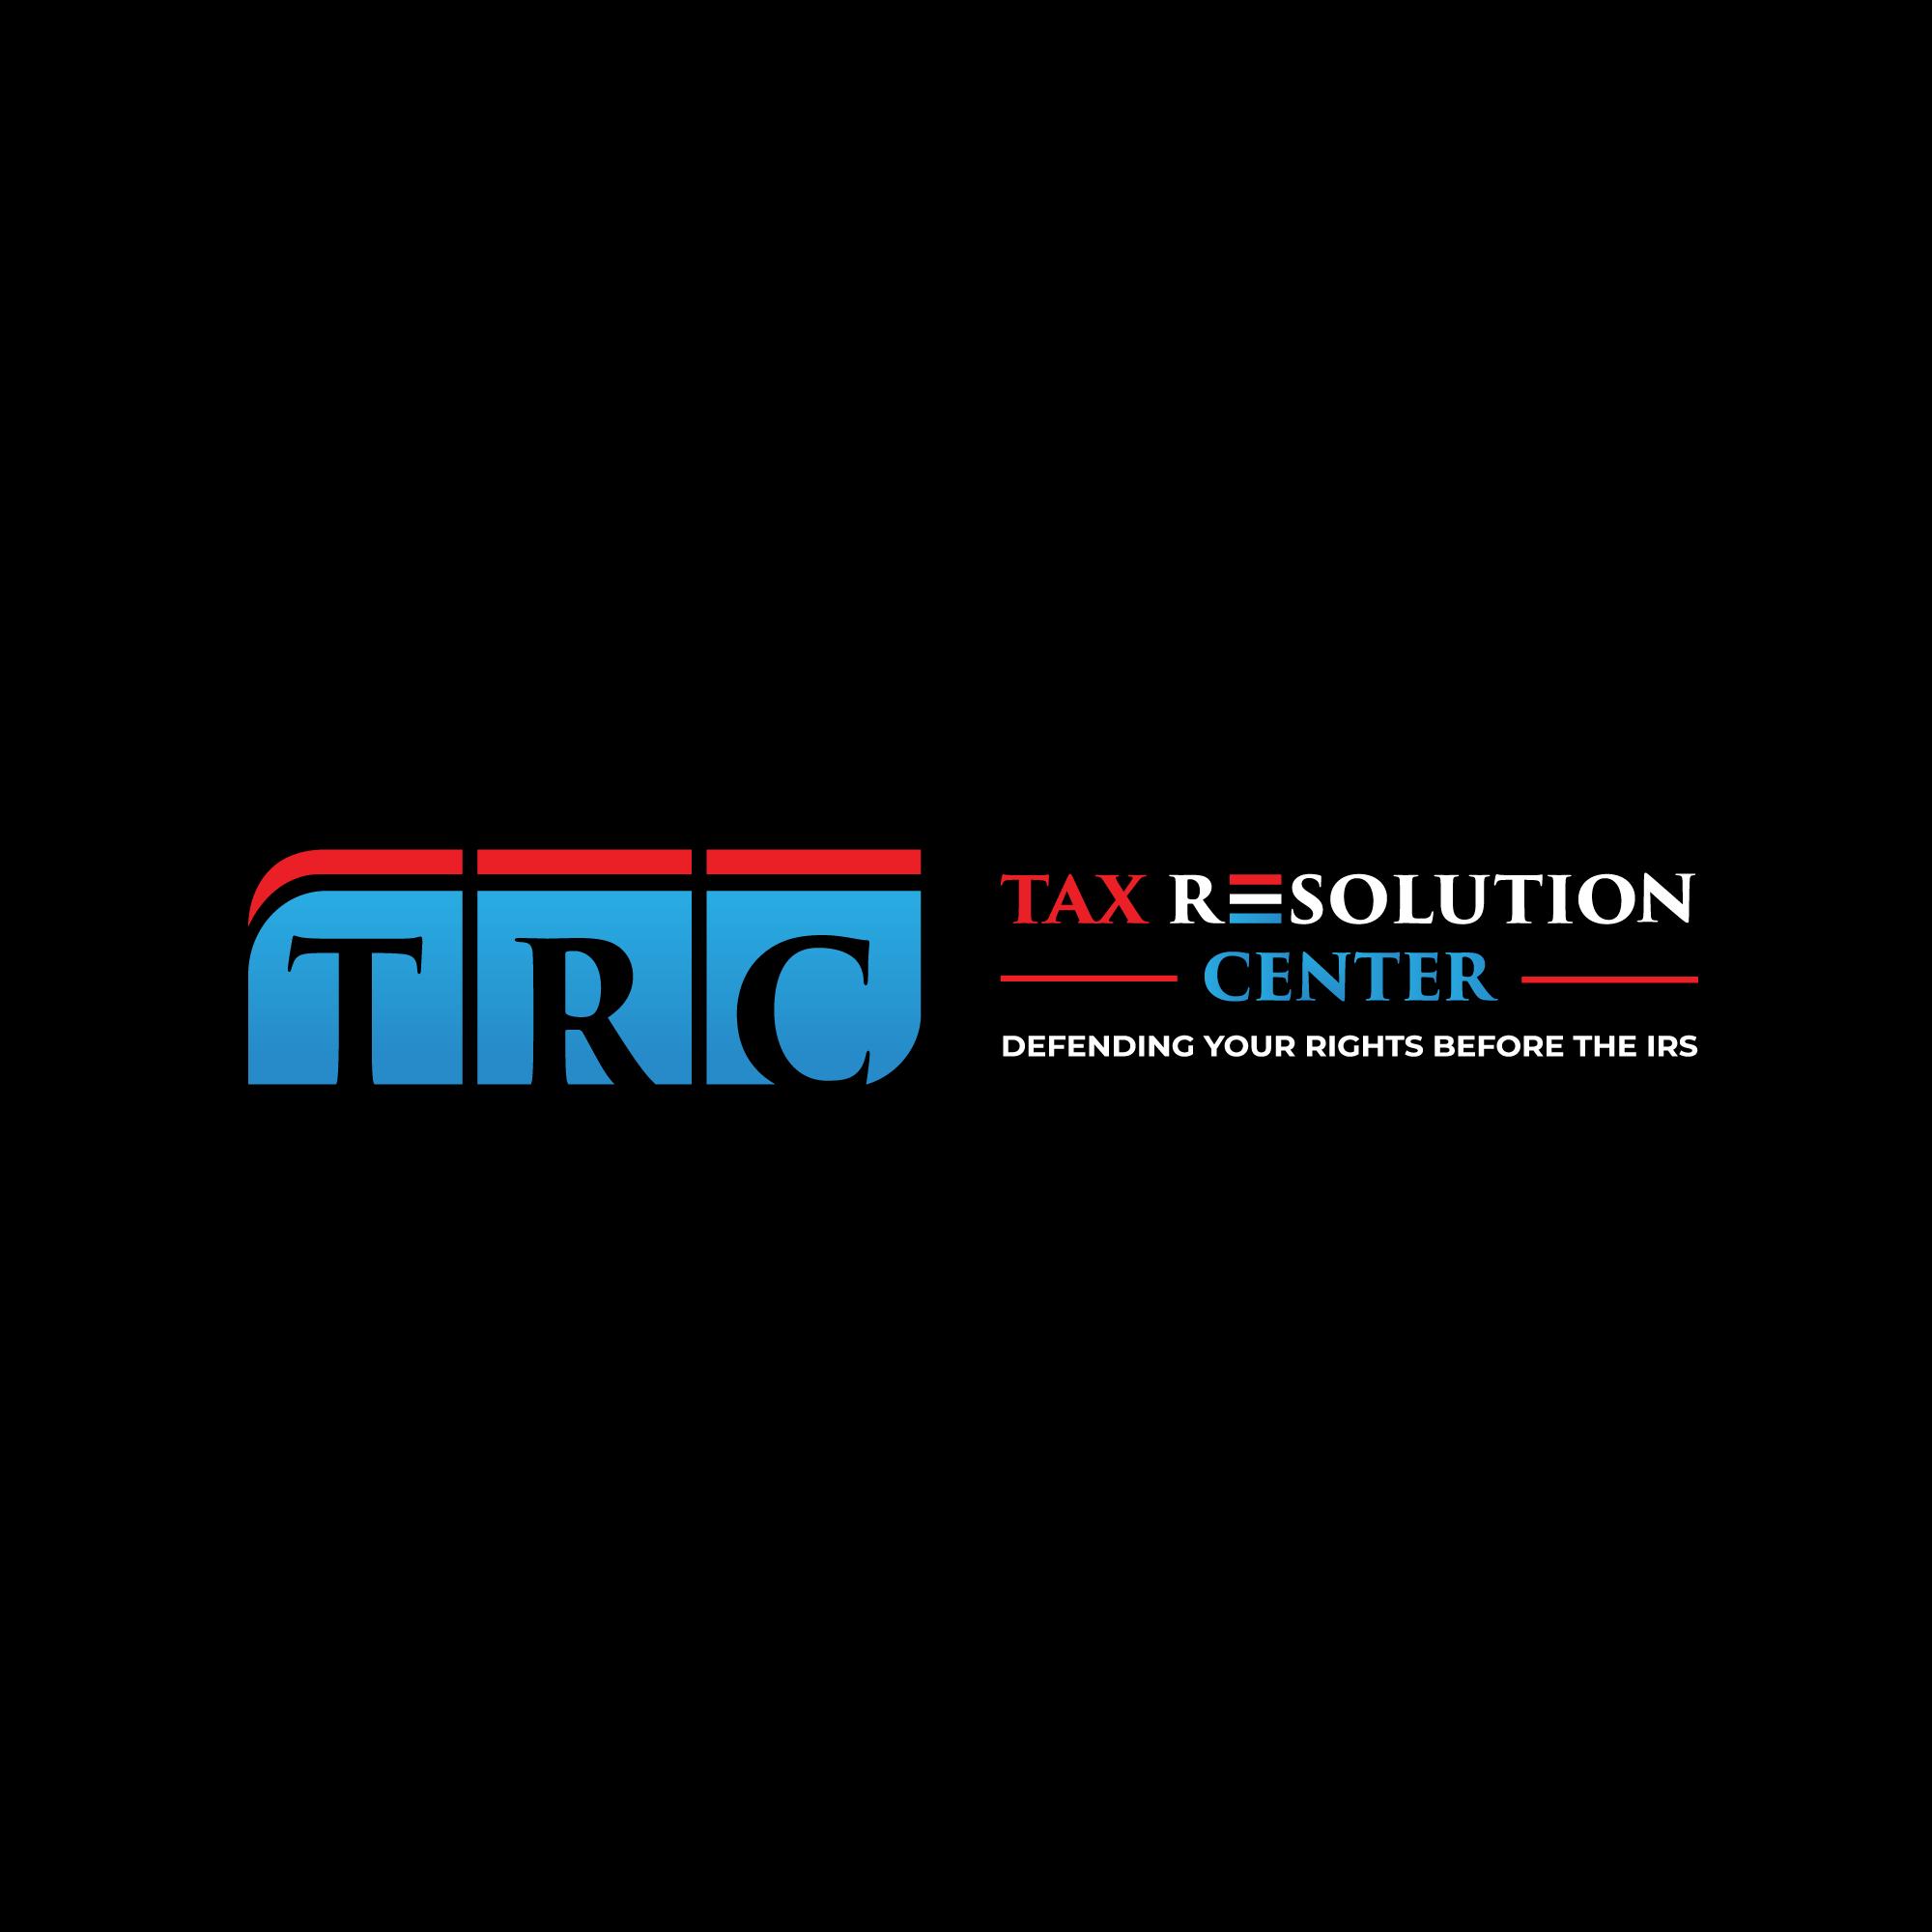 Tax Resolution Center